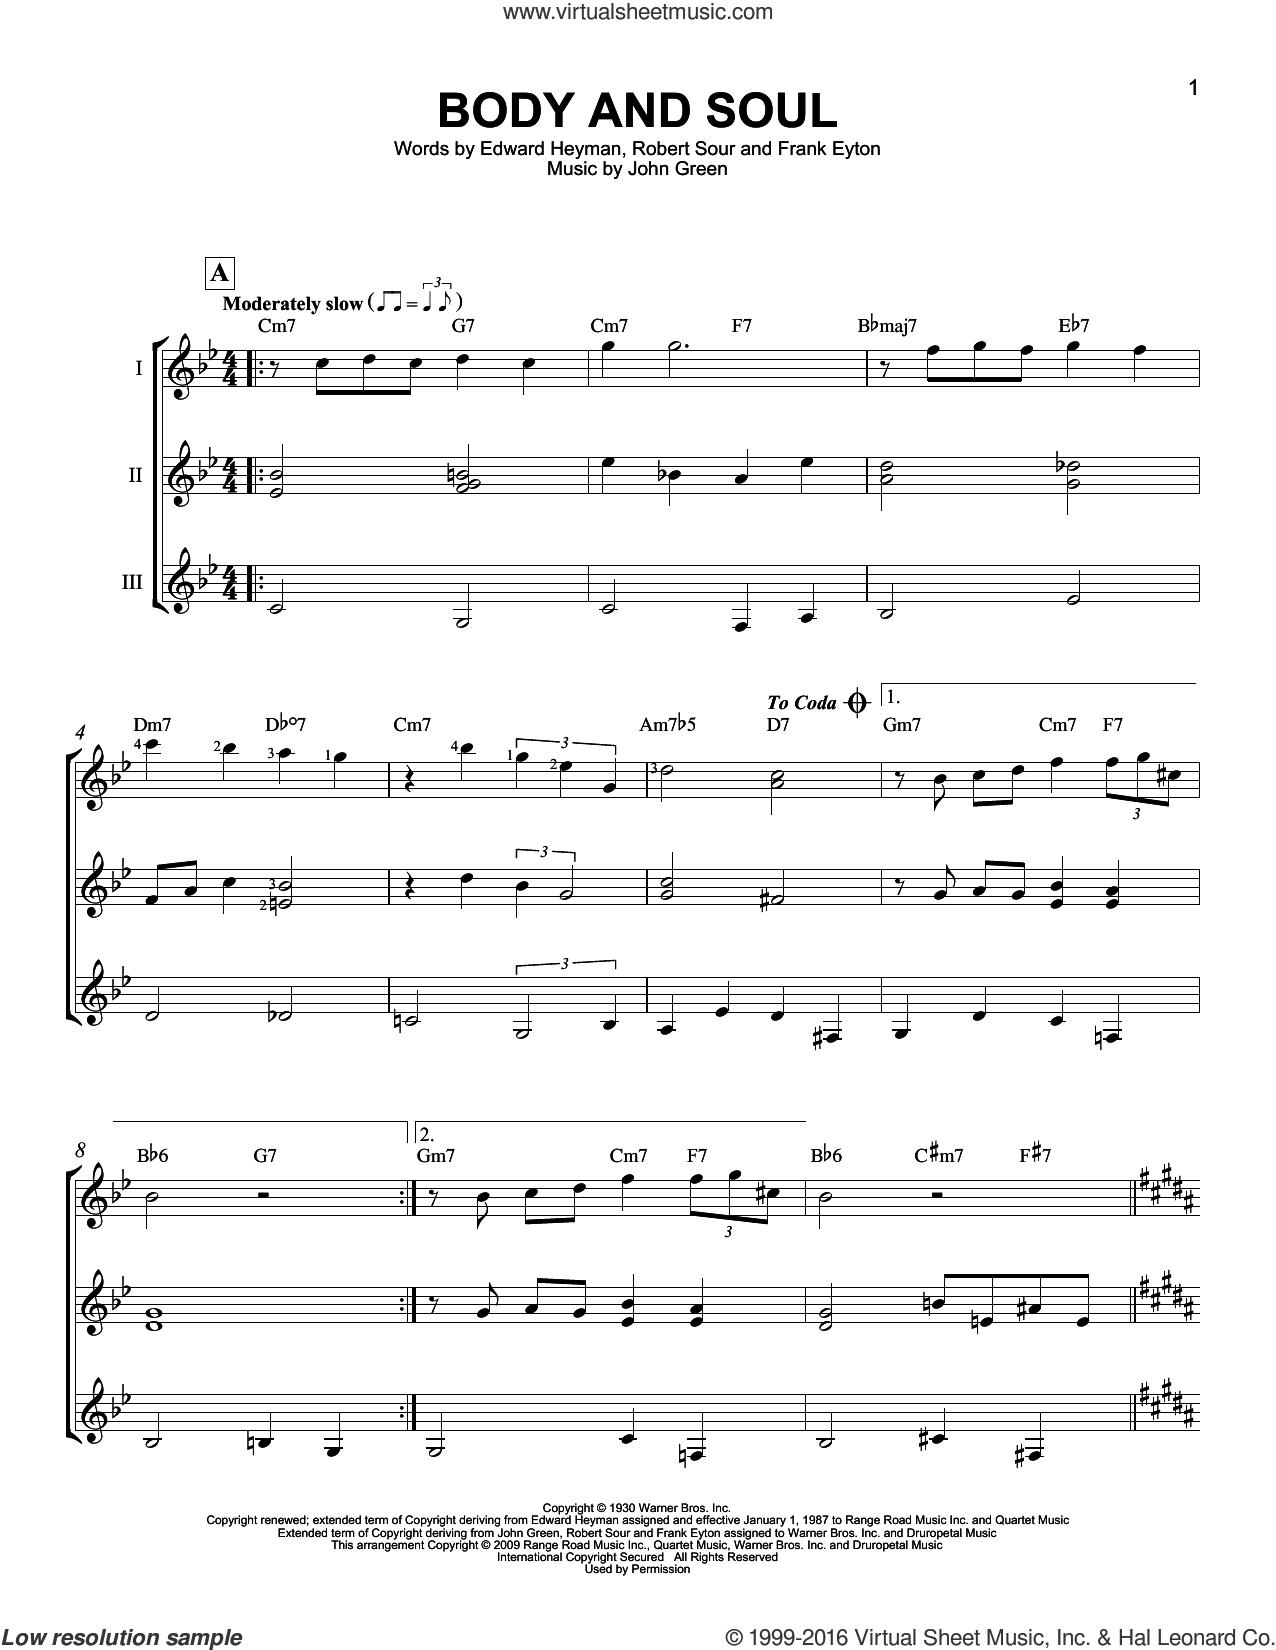 Body And Soul sheet music for guitar ensemble by Johnny Green, Tony Bennett & Amy Winehouse, Edward Heyman, Frank Eyton and Robert Sour, intermediate skill level